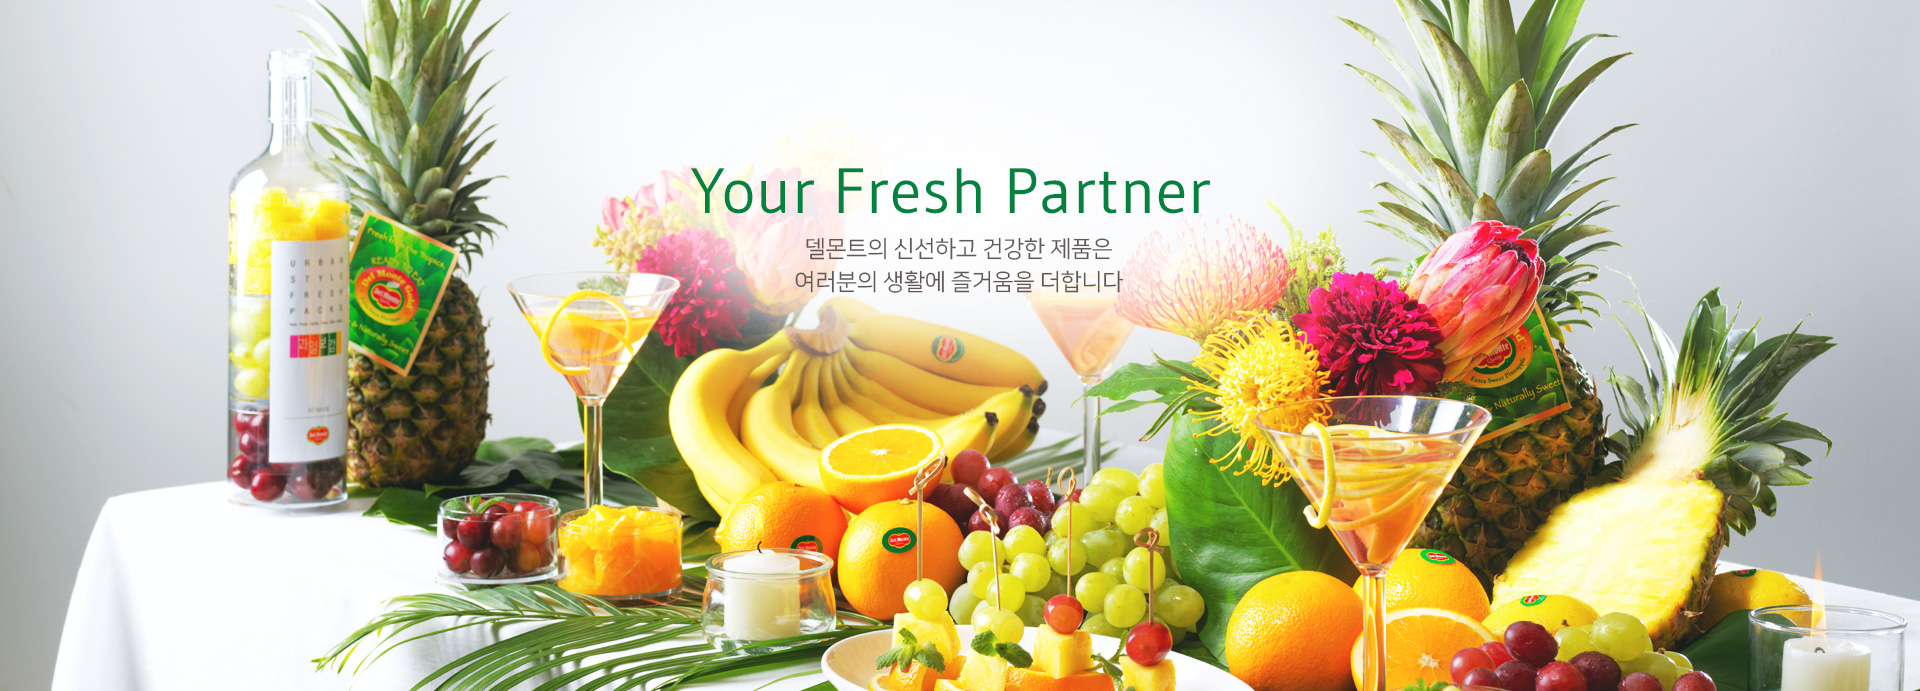 Your Fresh Partner 델몬트의 신선하고 건강한 제품은 여러분의 생활에 즐거움을 더합니다